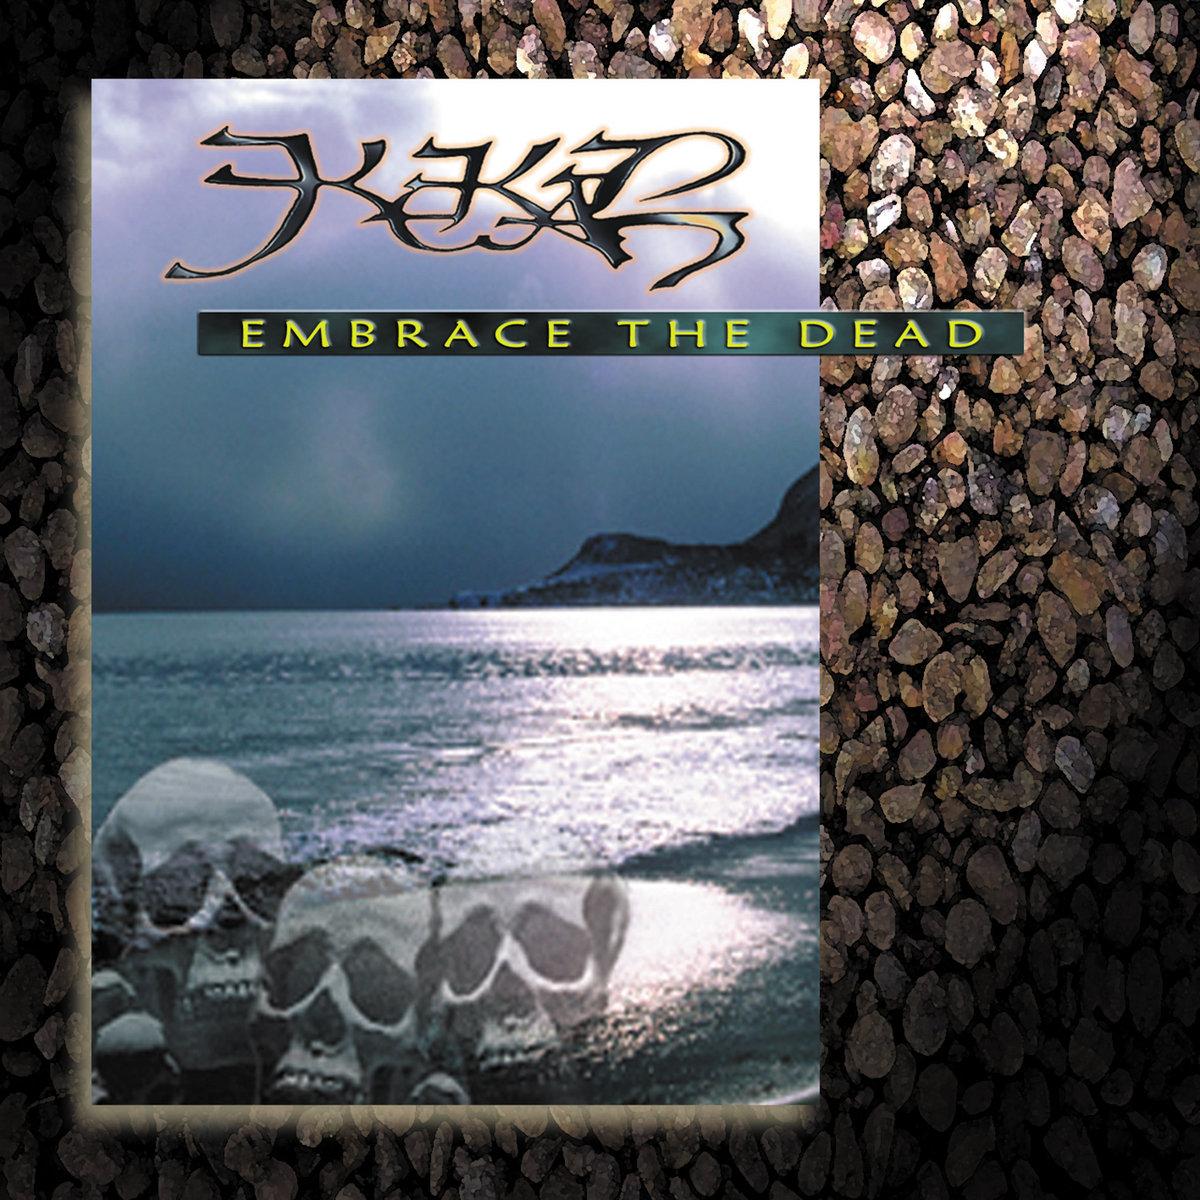 Kekal — Embrace the Dead